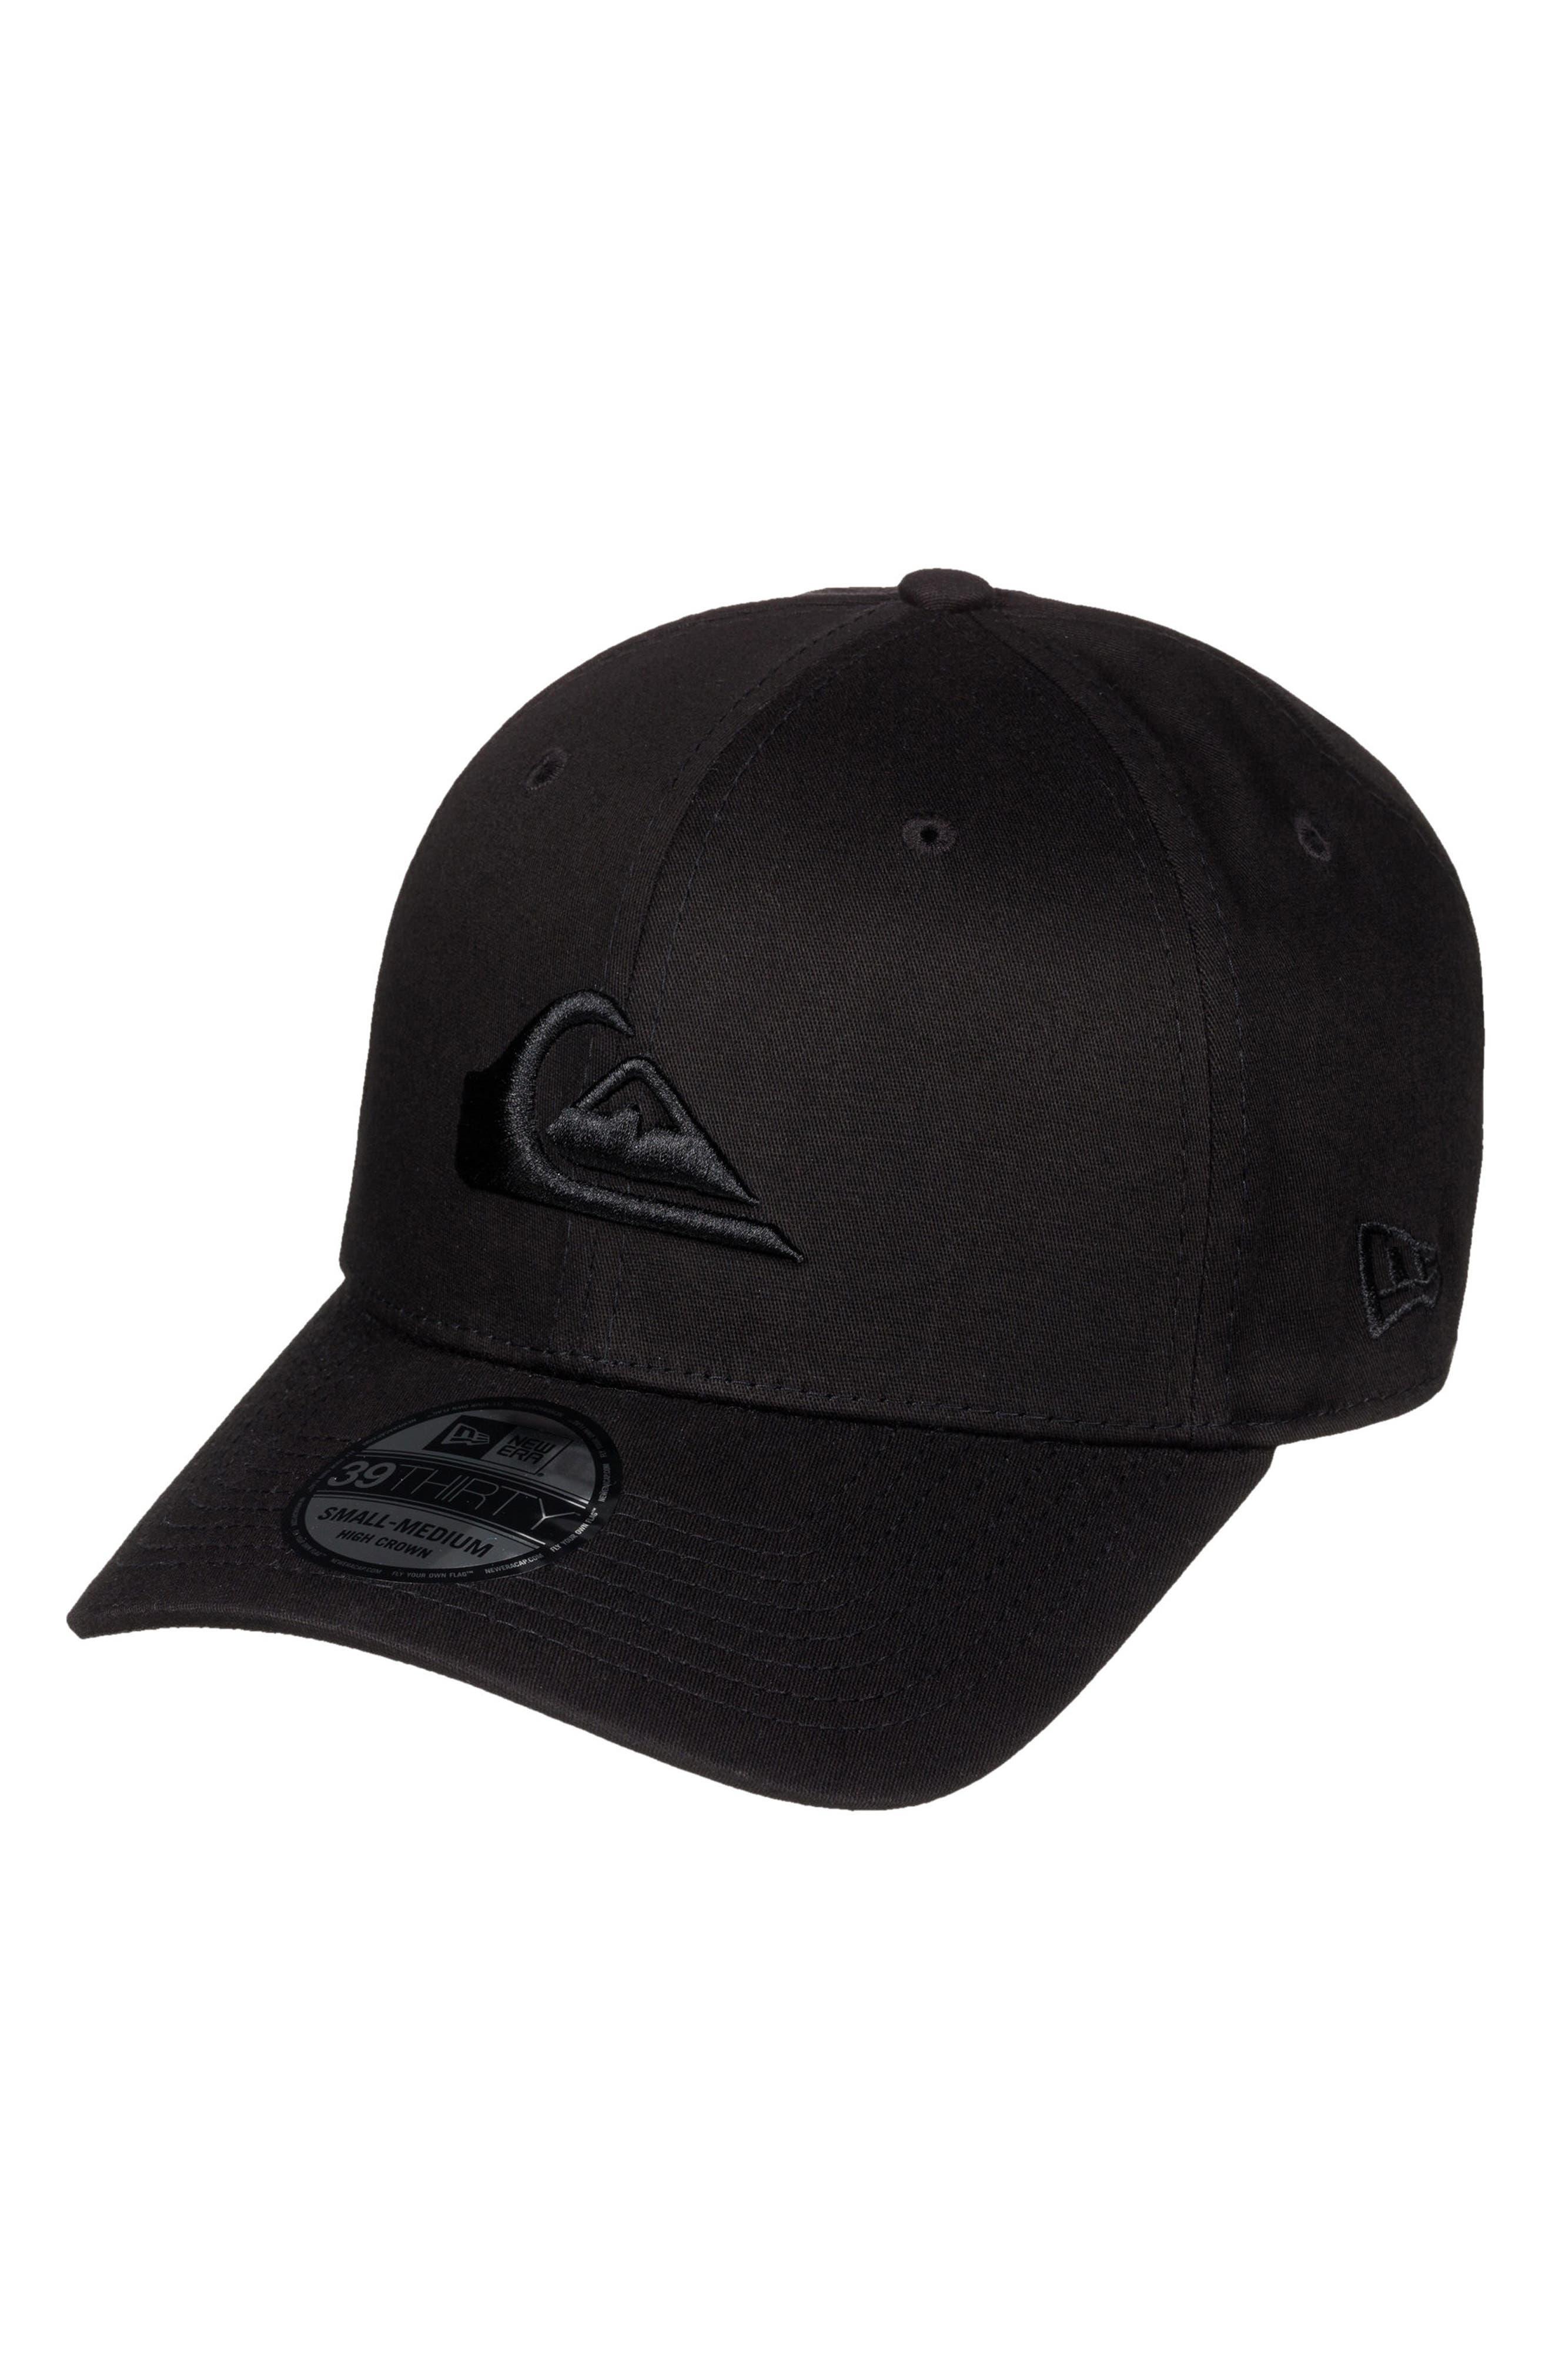 Mountain & Wave Baseball Cap,                         Main,                         color, BLACK